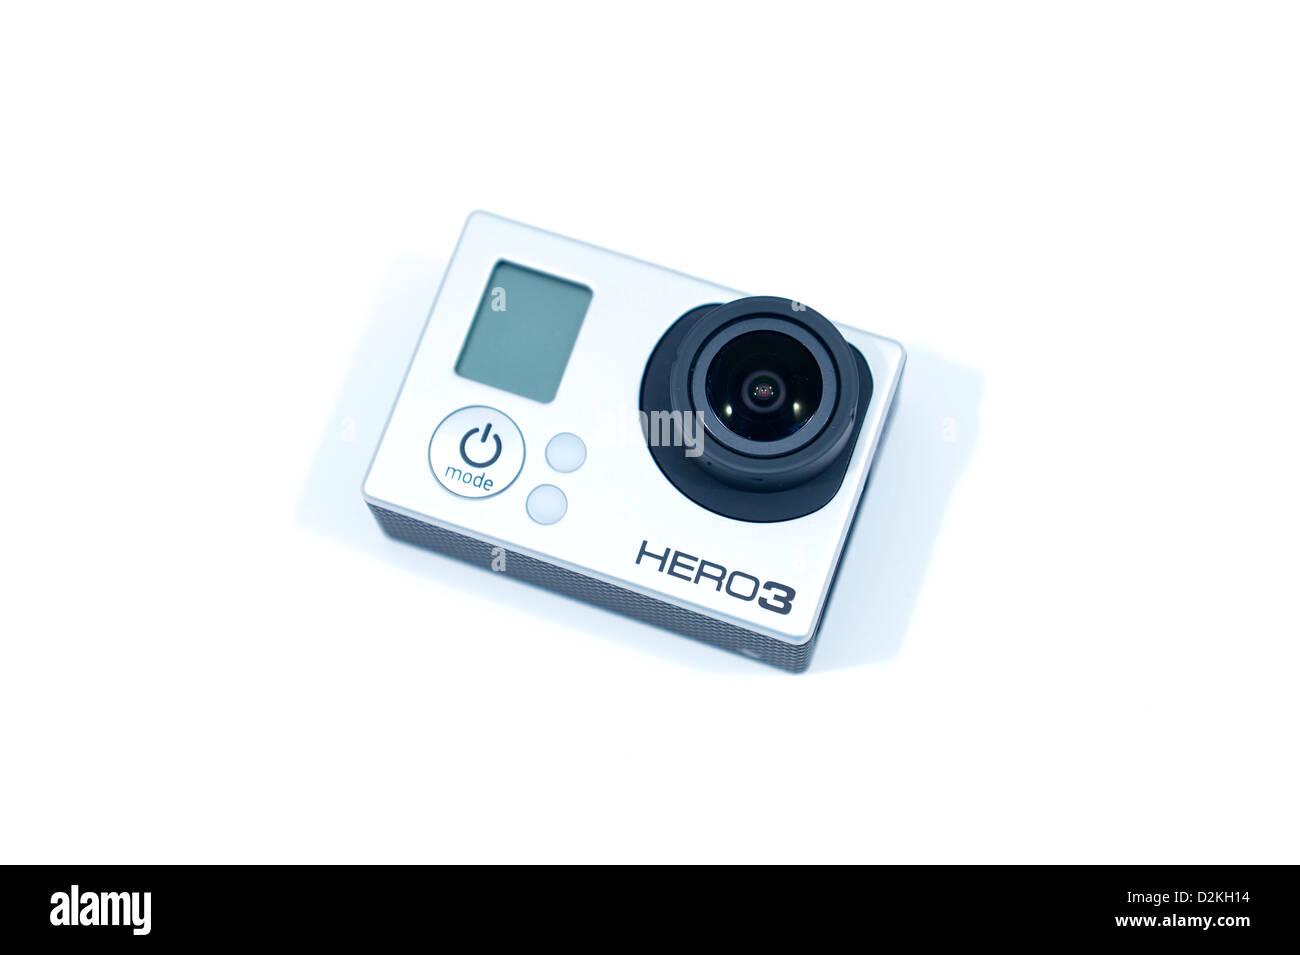 GoPro Hero 3 Black Edition camera - Stock Image